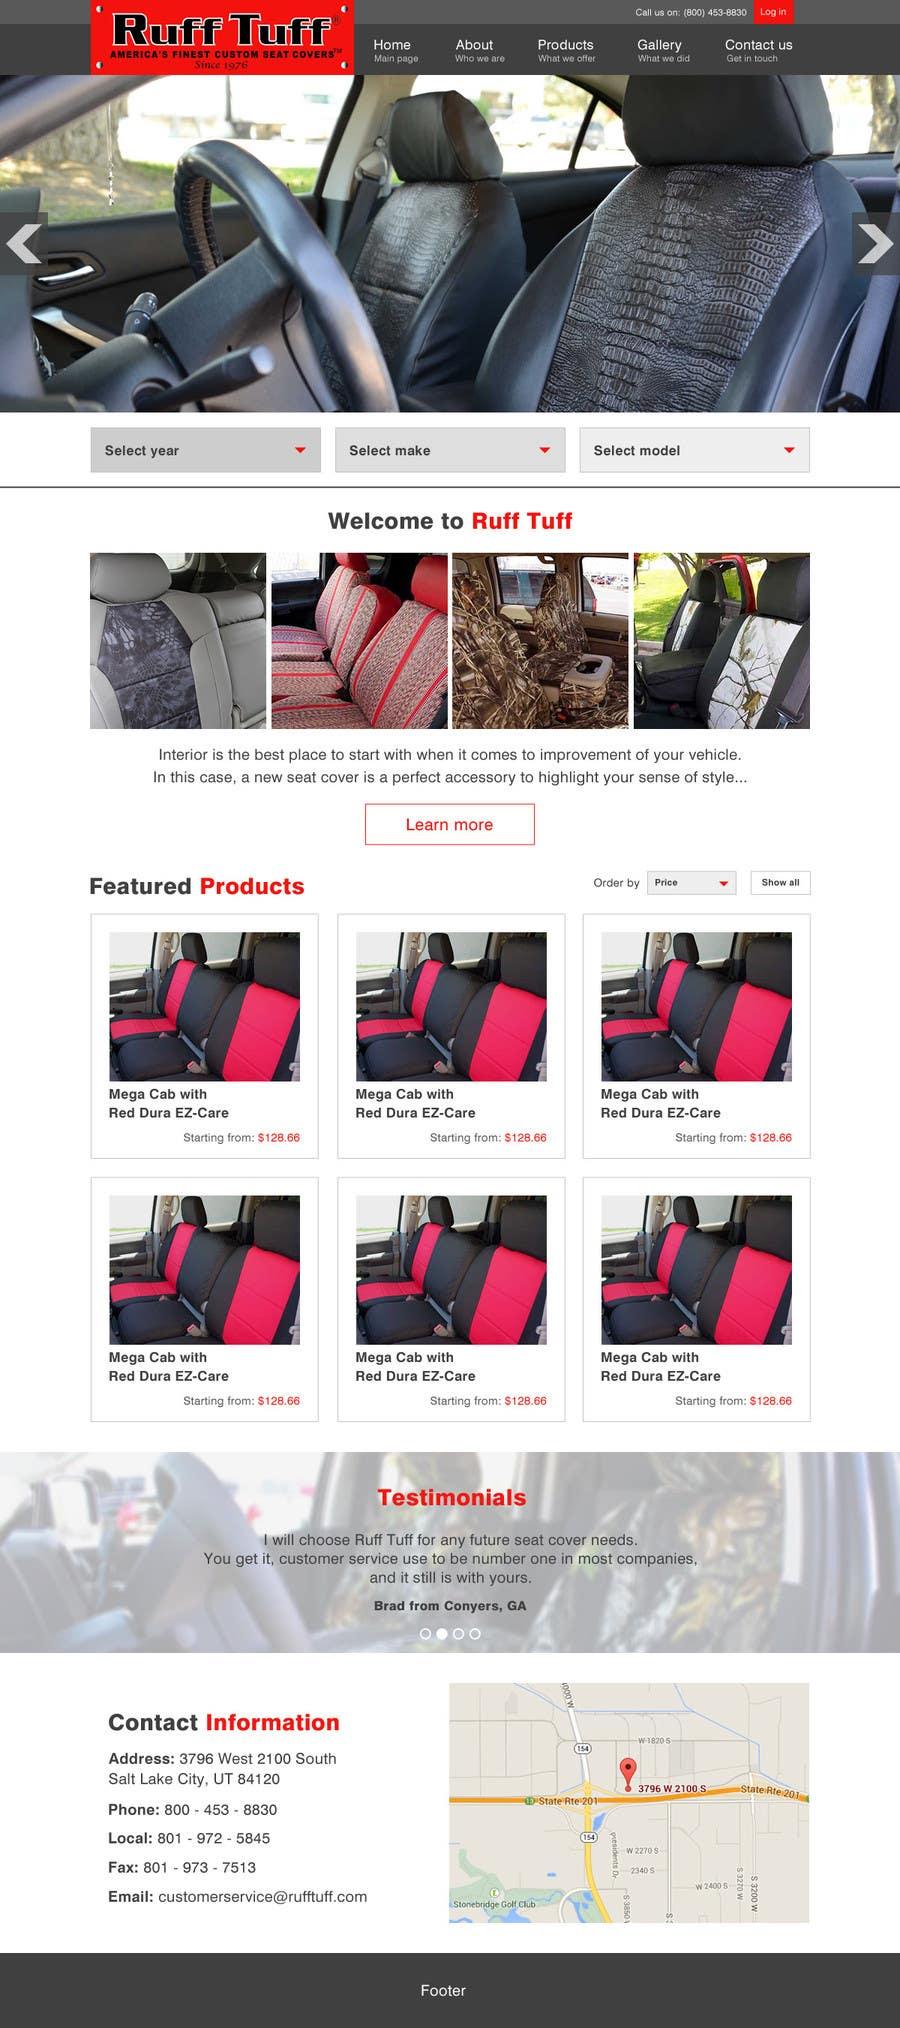 Penyertaan Peraduan #                                        4                                      untuk                                         Design a Website Mockup for an auto seat cover manufacturer